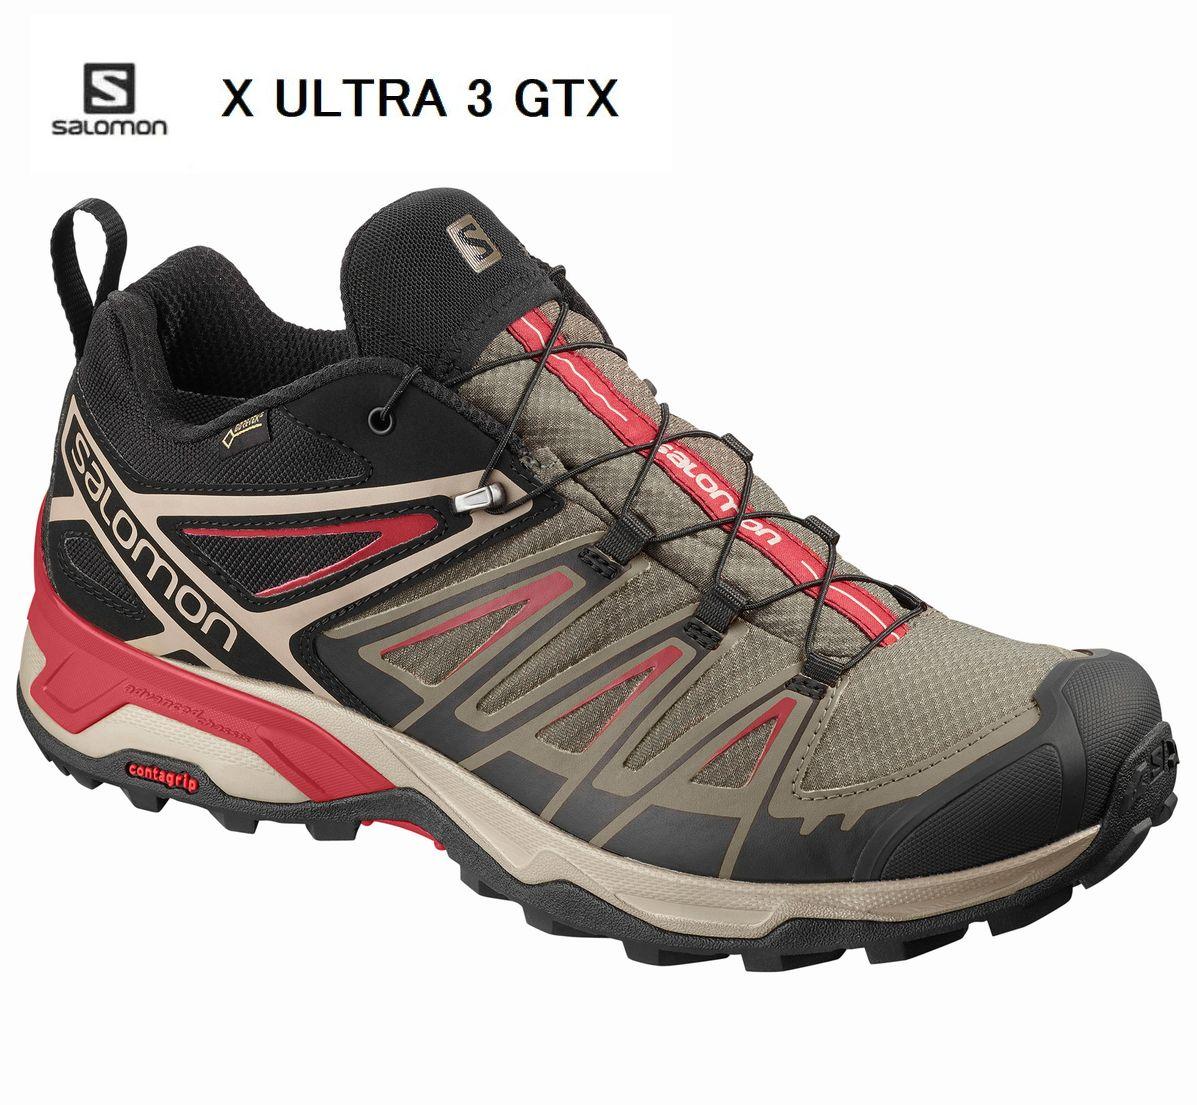 SALOMON X ULTRA 3 GTX ハイキング シューズ BUNGEE CORD ゴアテックス L40674900